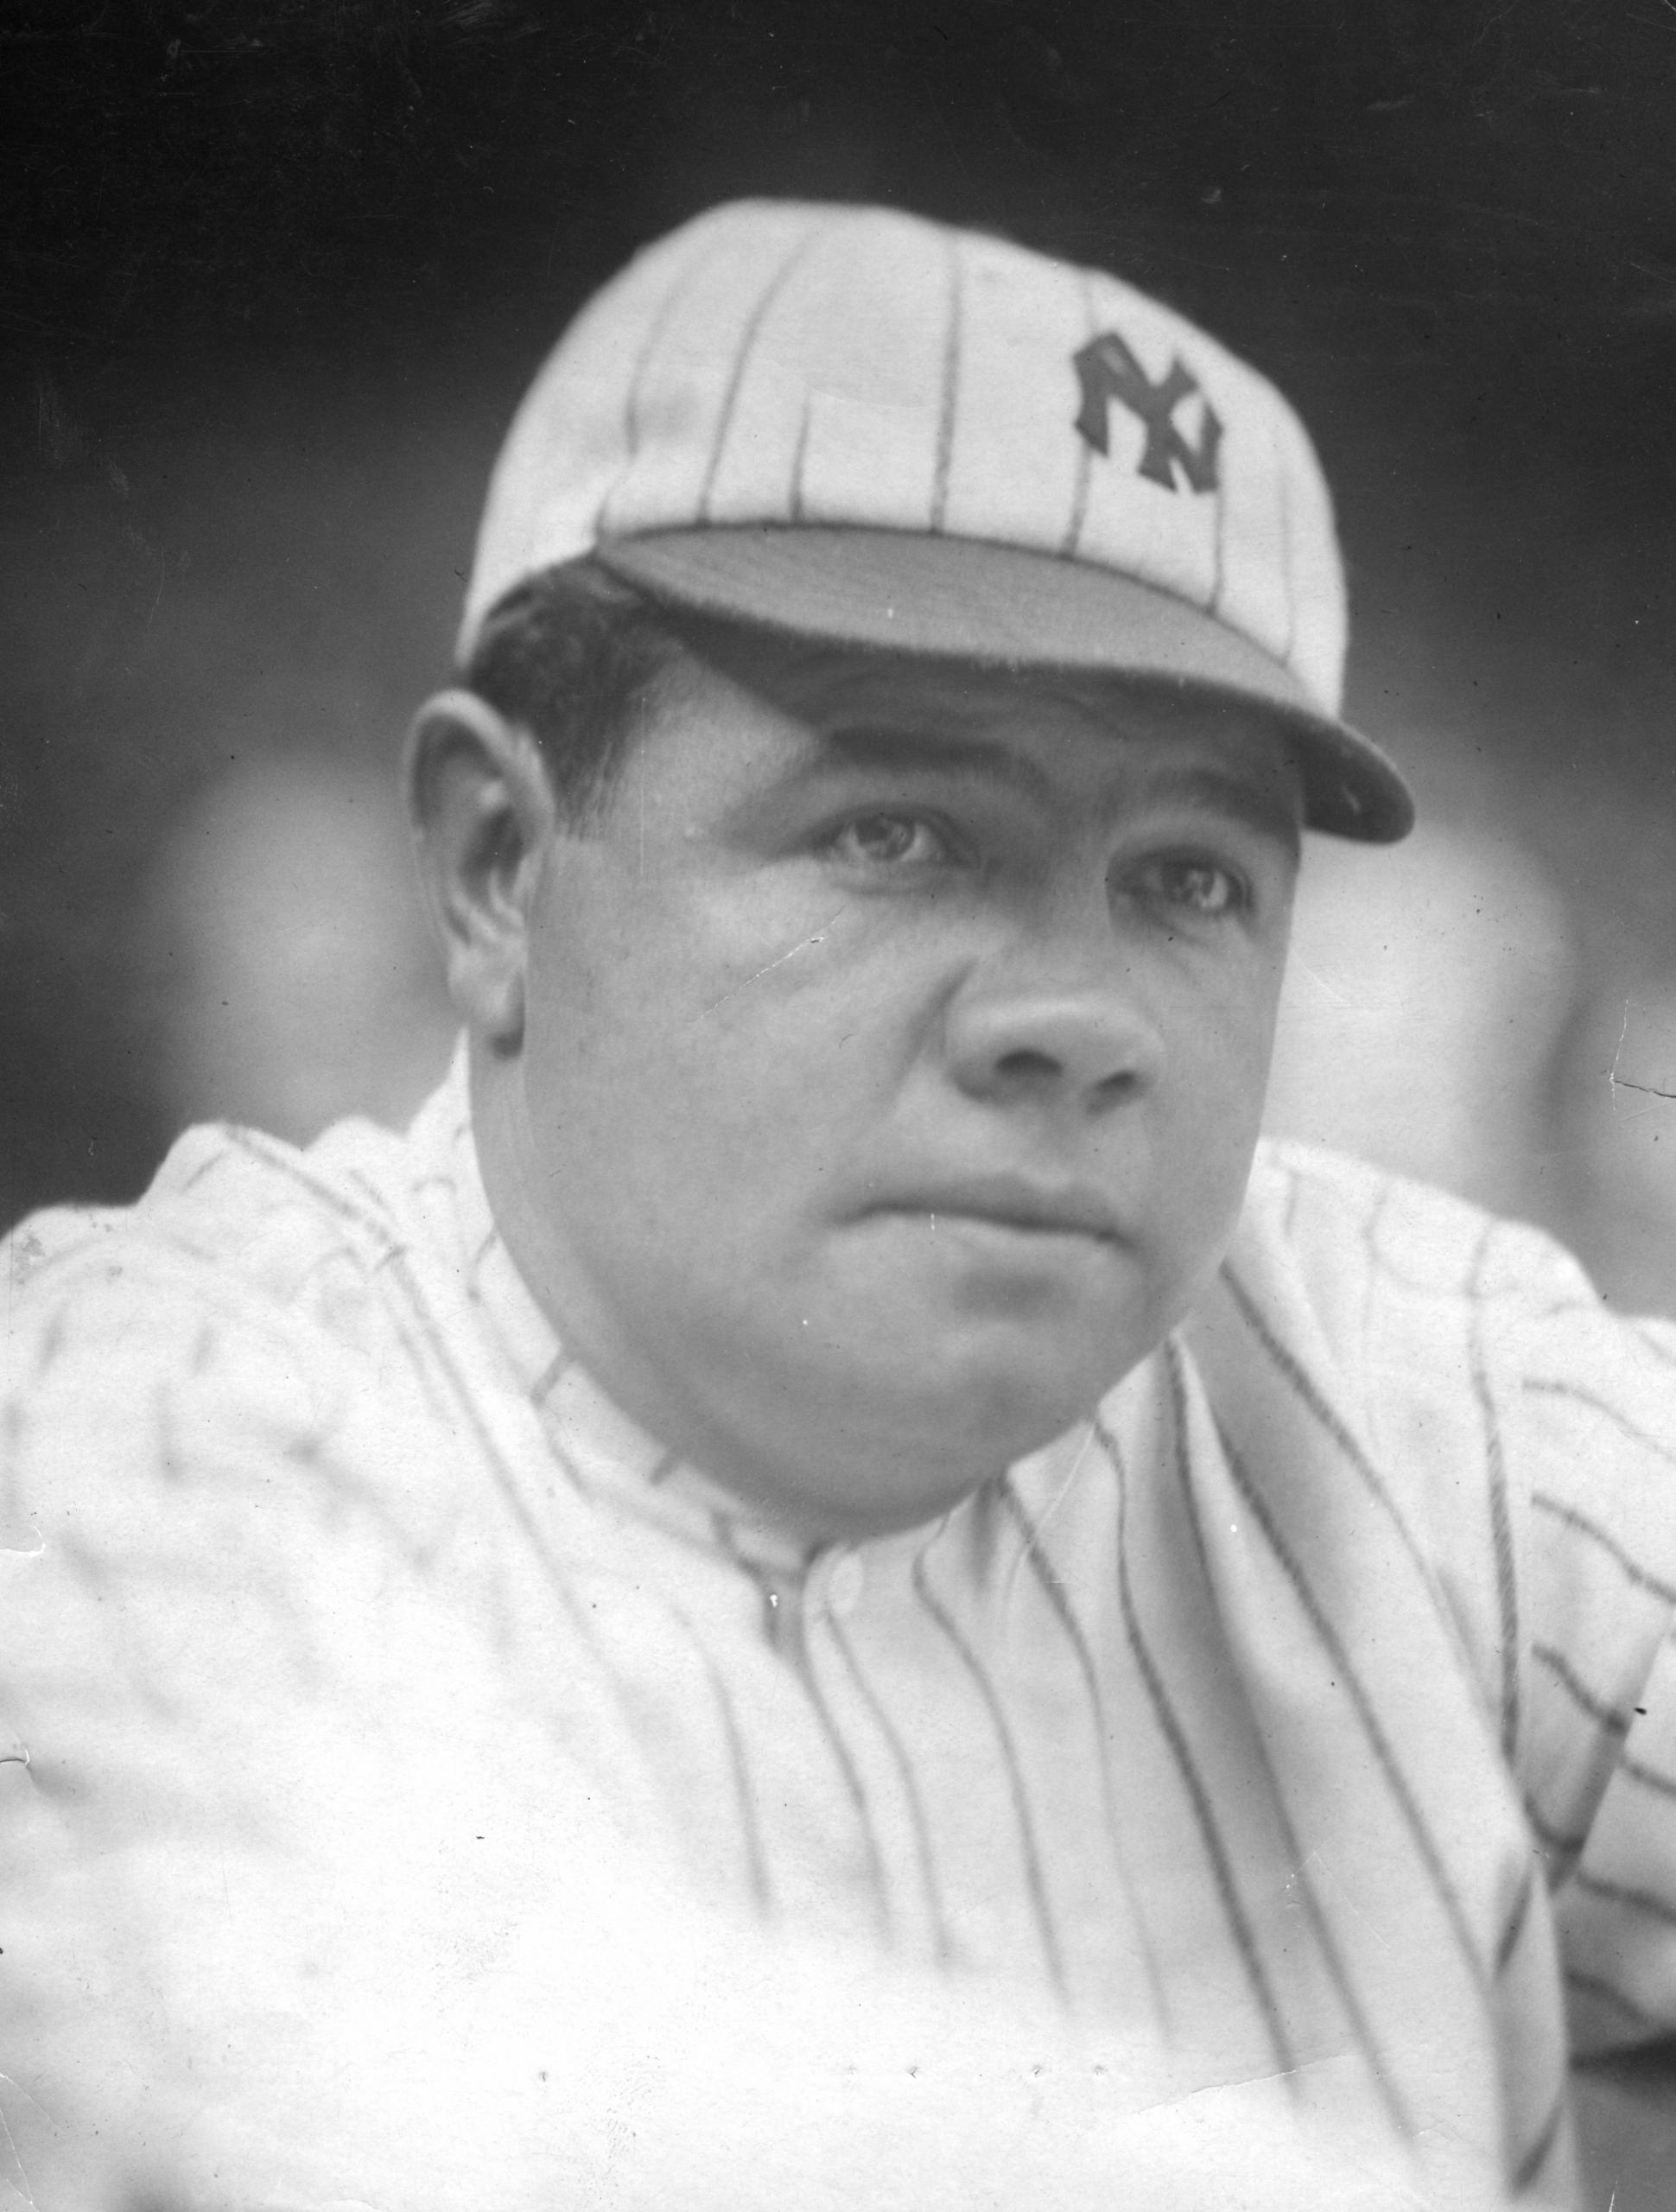 Babe Ruth, circa 1921 (NATIONAL BASEBALL HALL OF FAME LIBRARY)